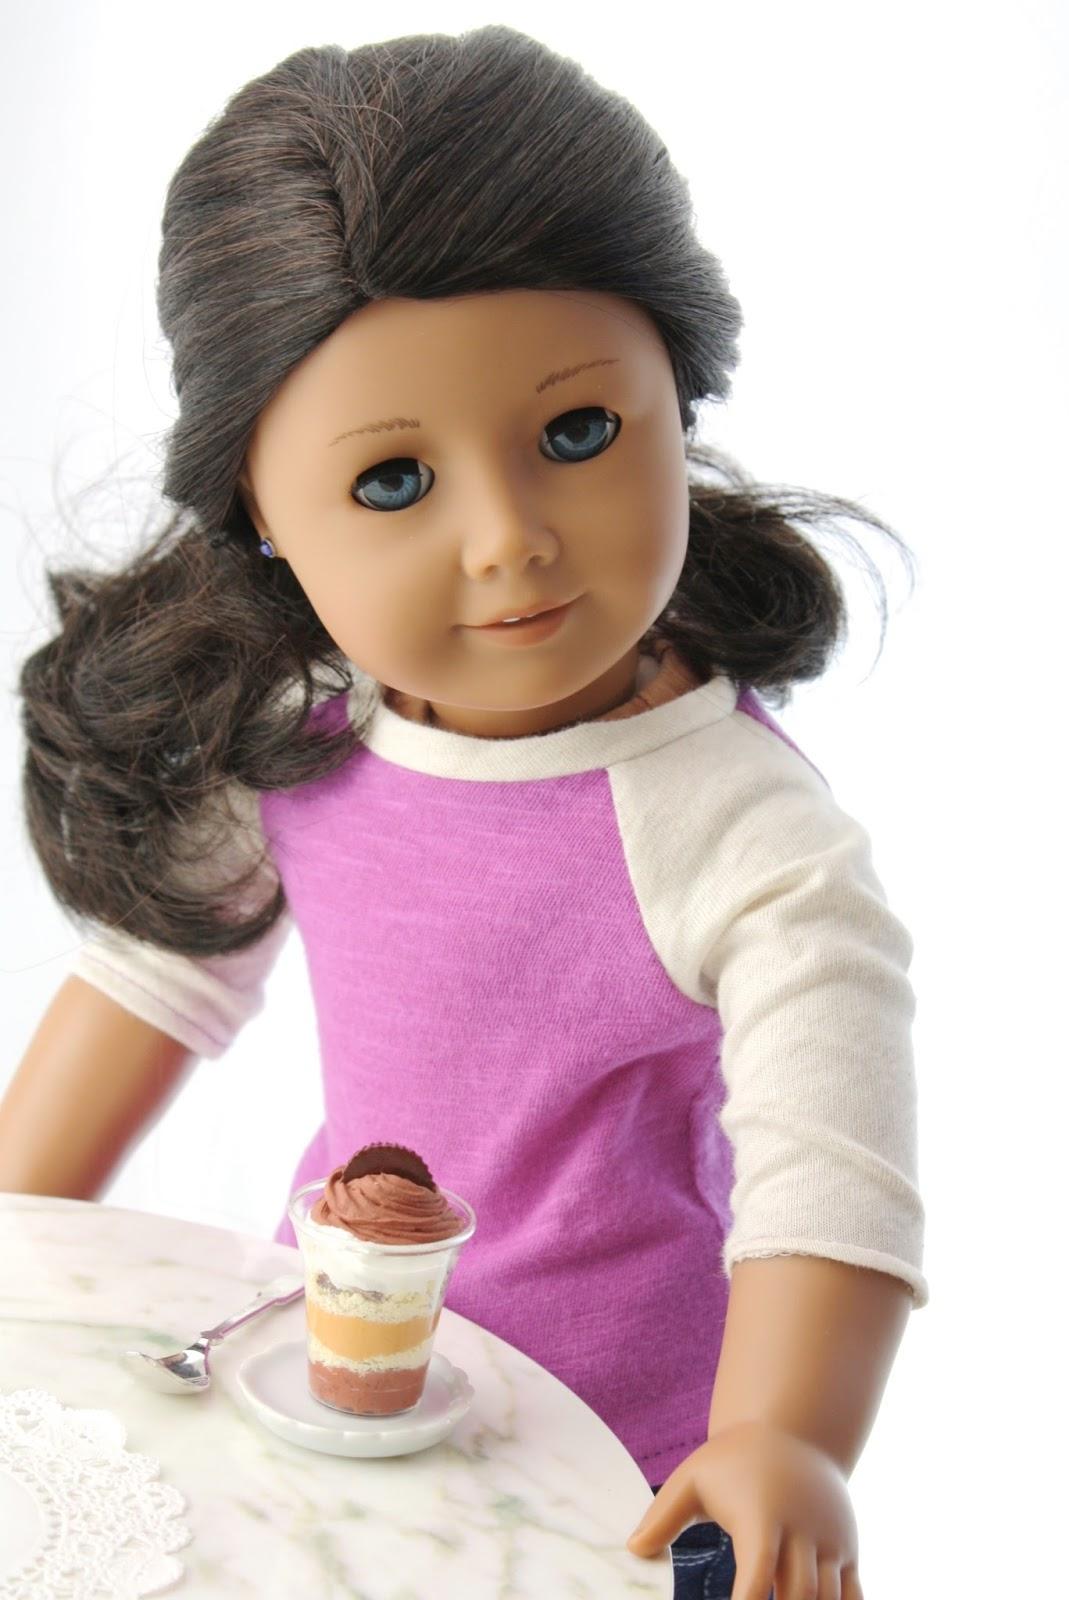 Pippaloo For Dolls: JANUARY MENU LIST